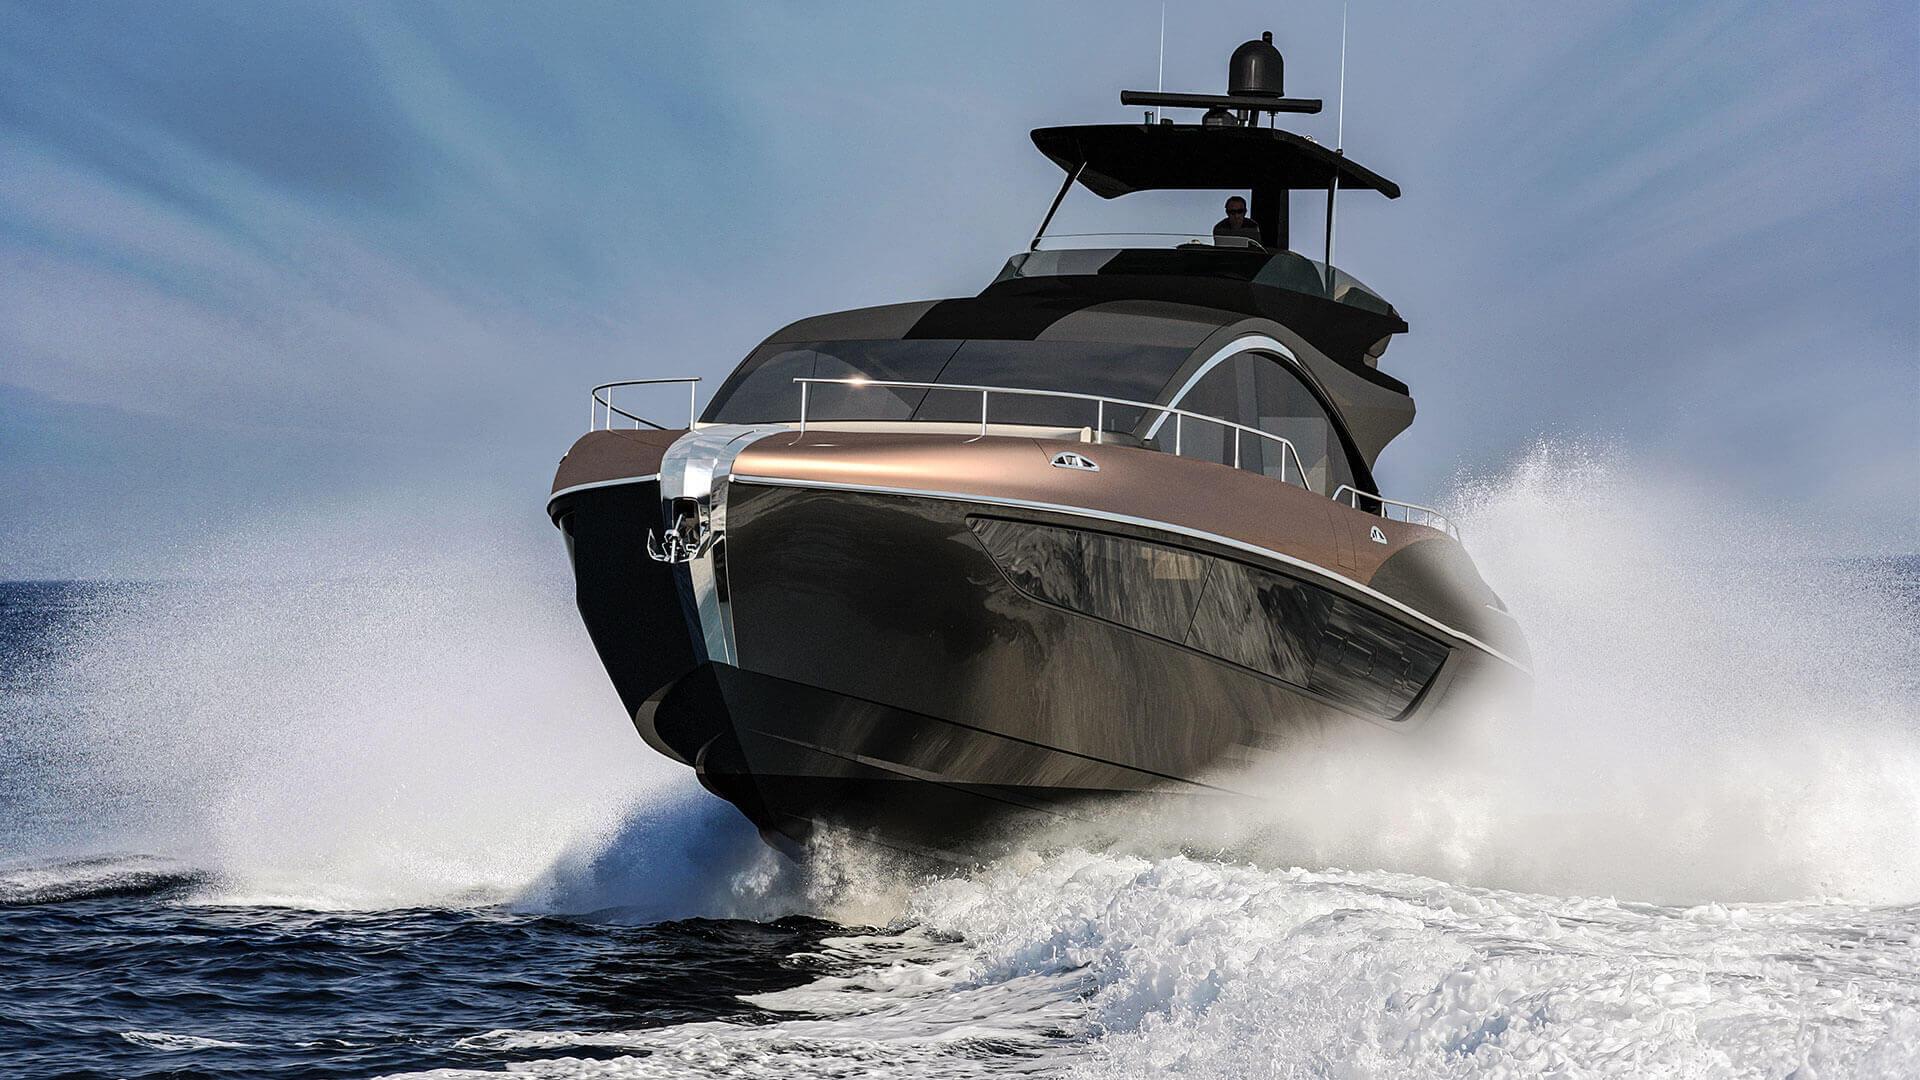 2019 lexus ly 650 luxury yacht gallery 04